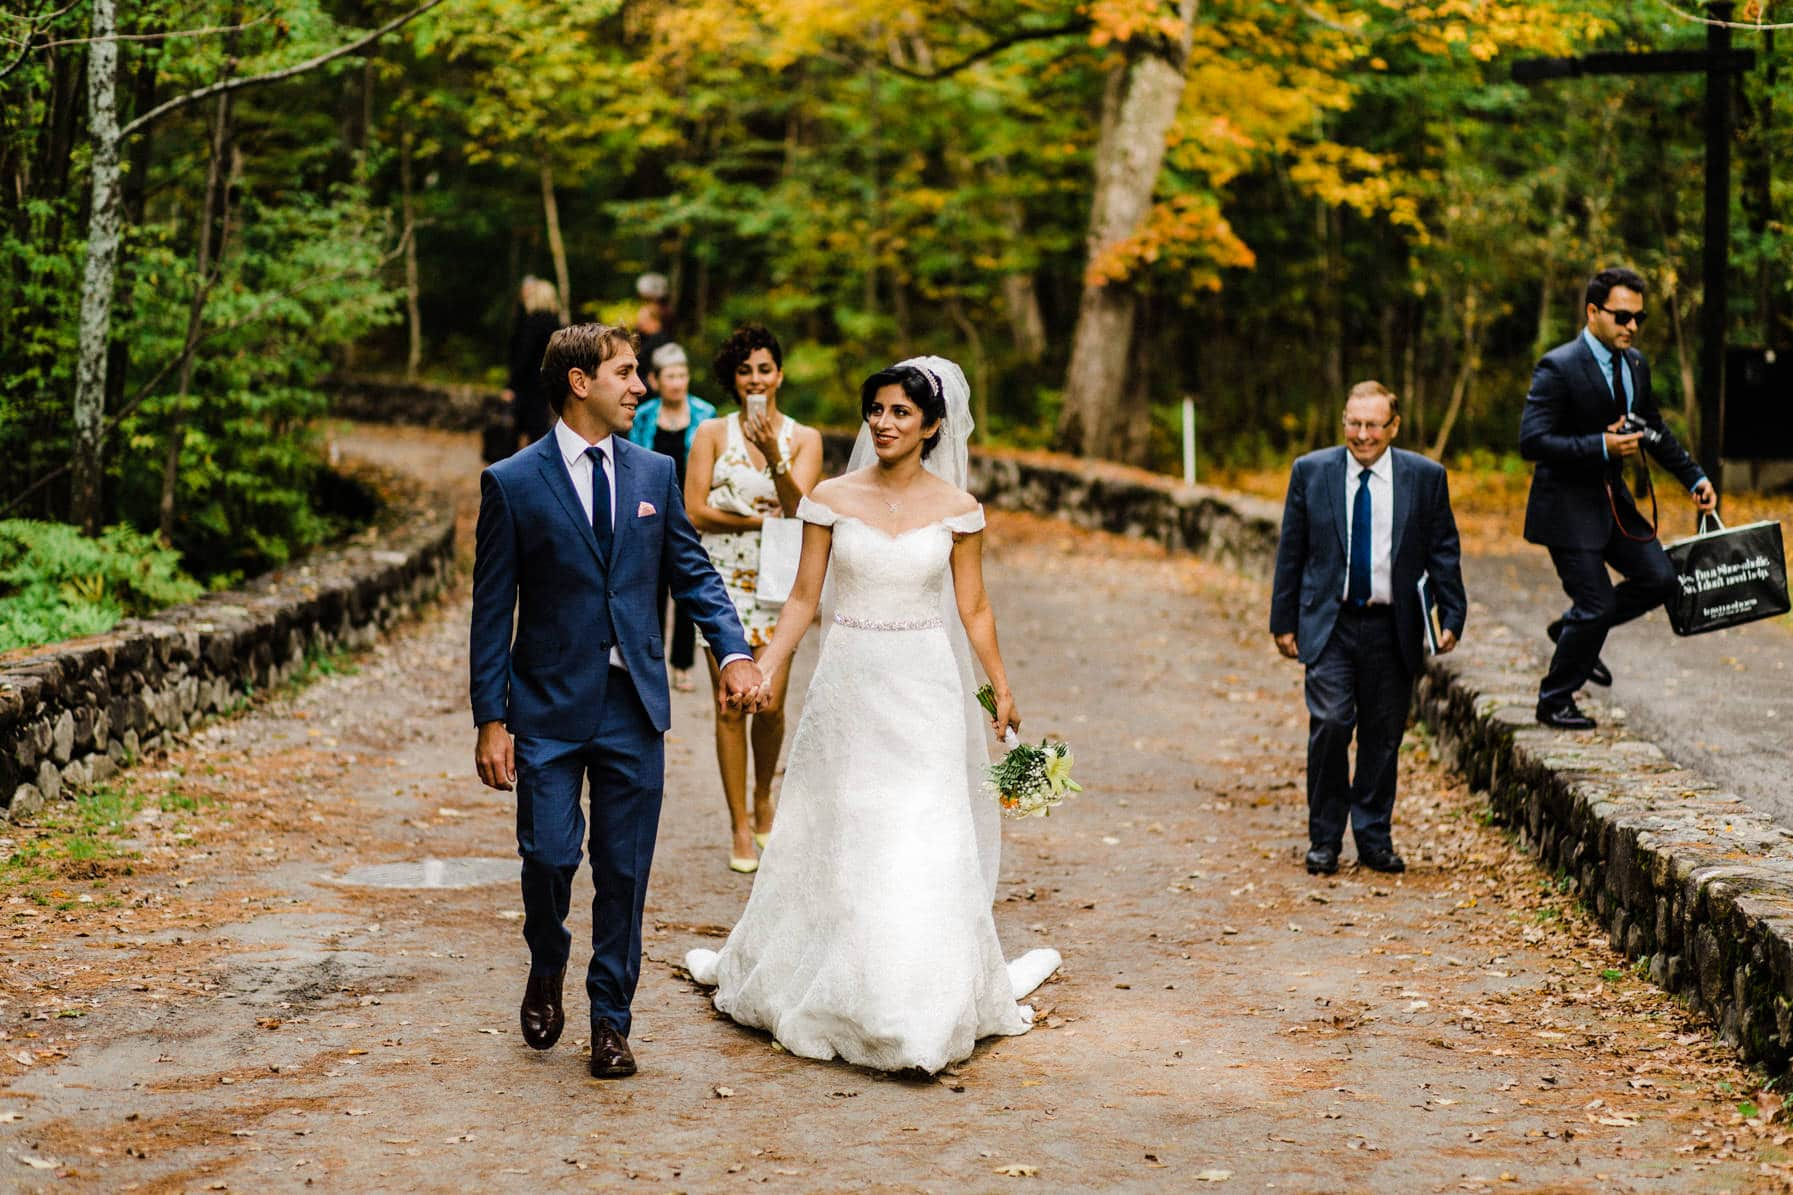 Walking to ceremony - Intimate Wedding Mackenzie King Estate